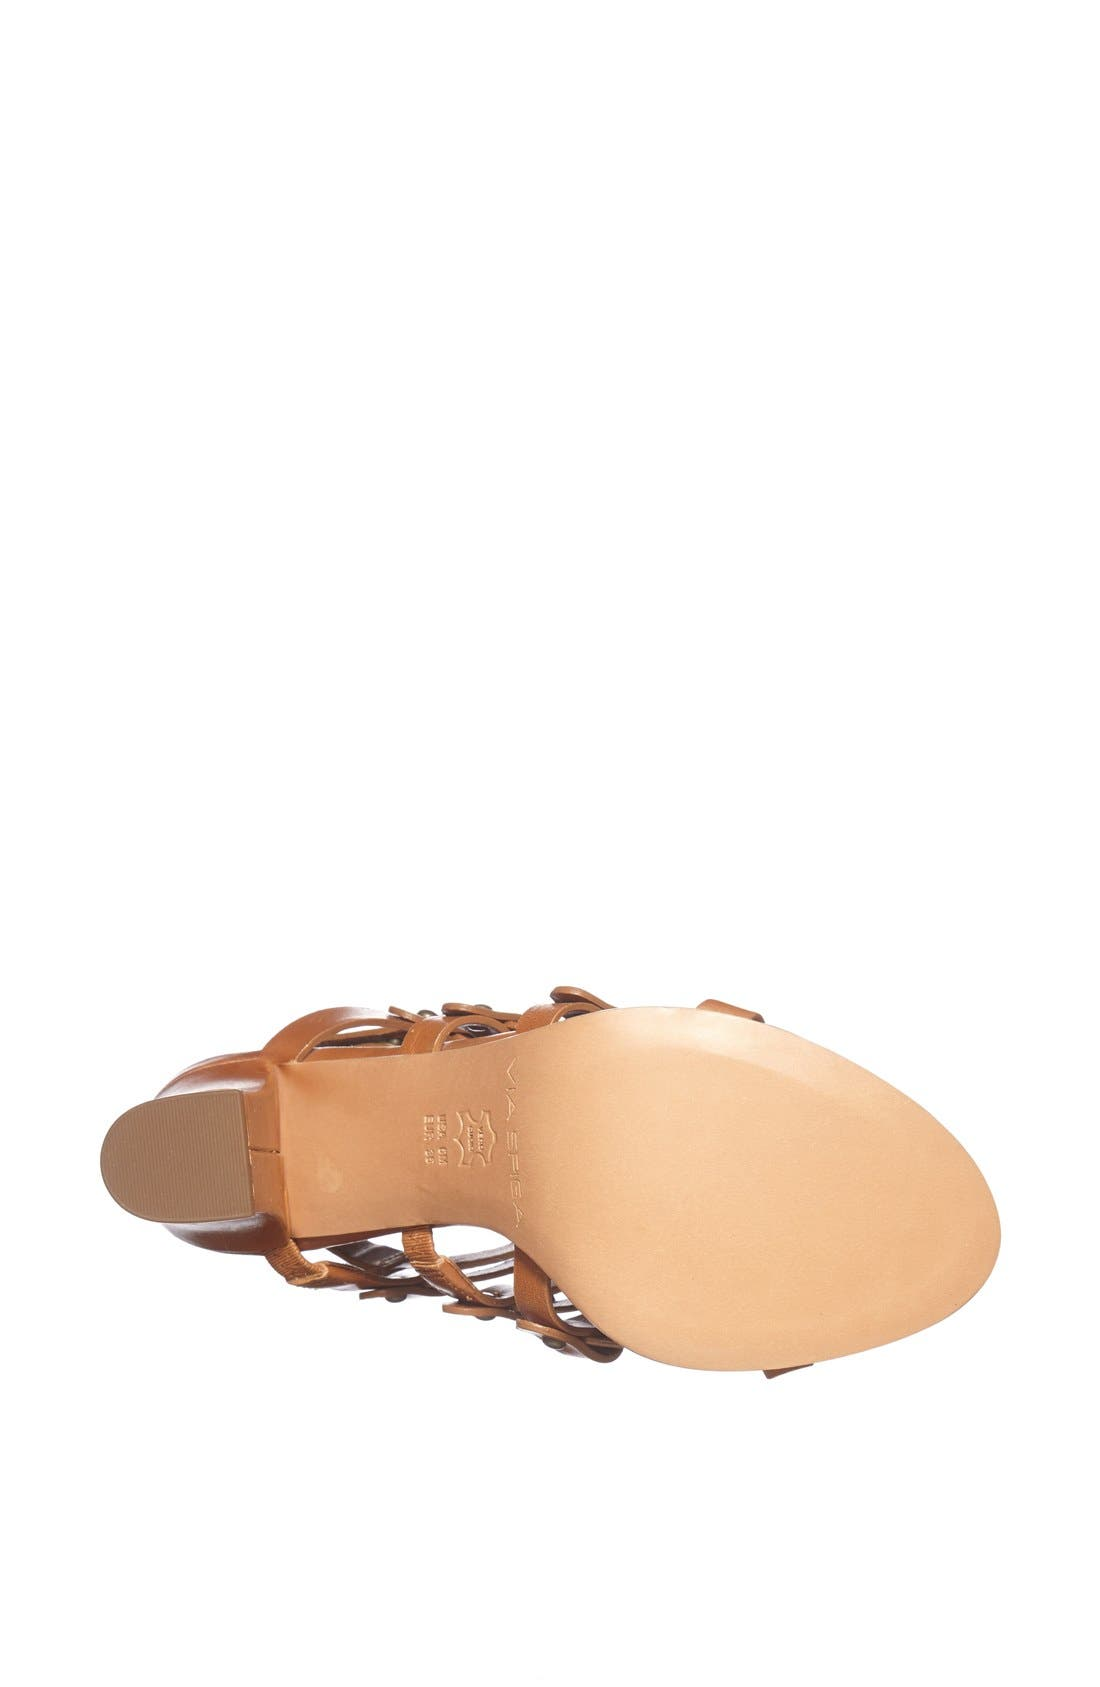 Alternate Image 3  - Via Spiga 'Federica' Sandal